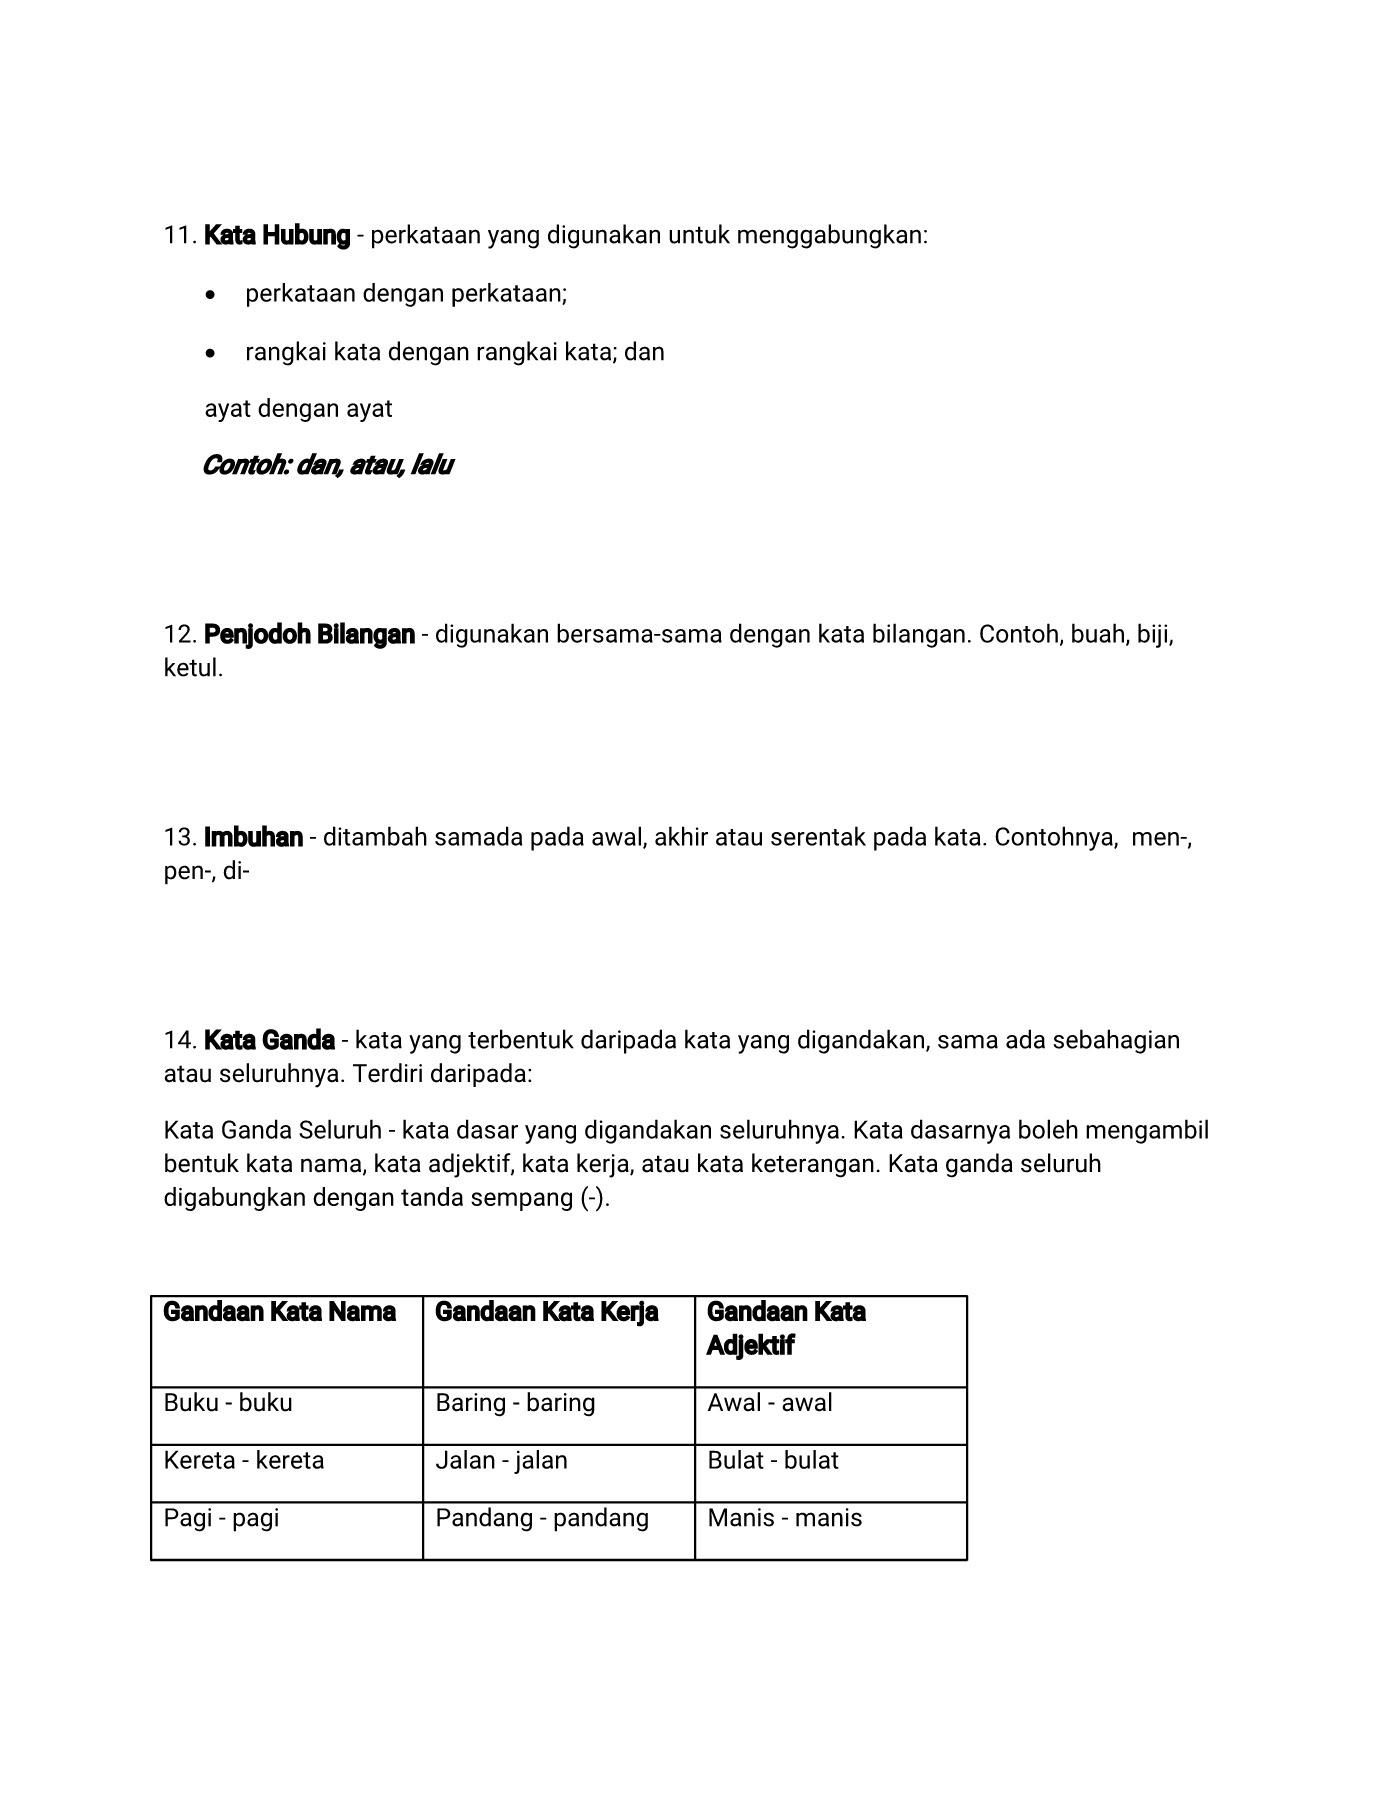 Contoh Ayat Kata Hubung Contoh Soal Dan Materi Pelajaran 7